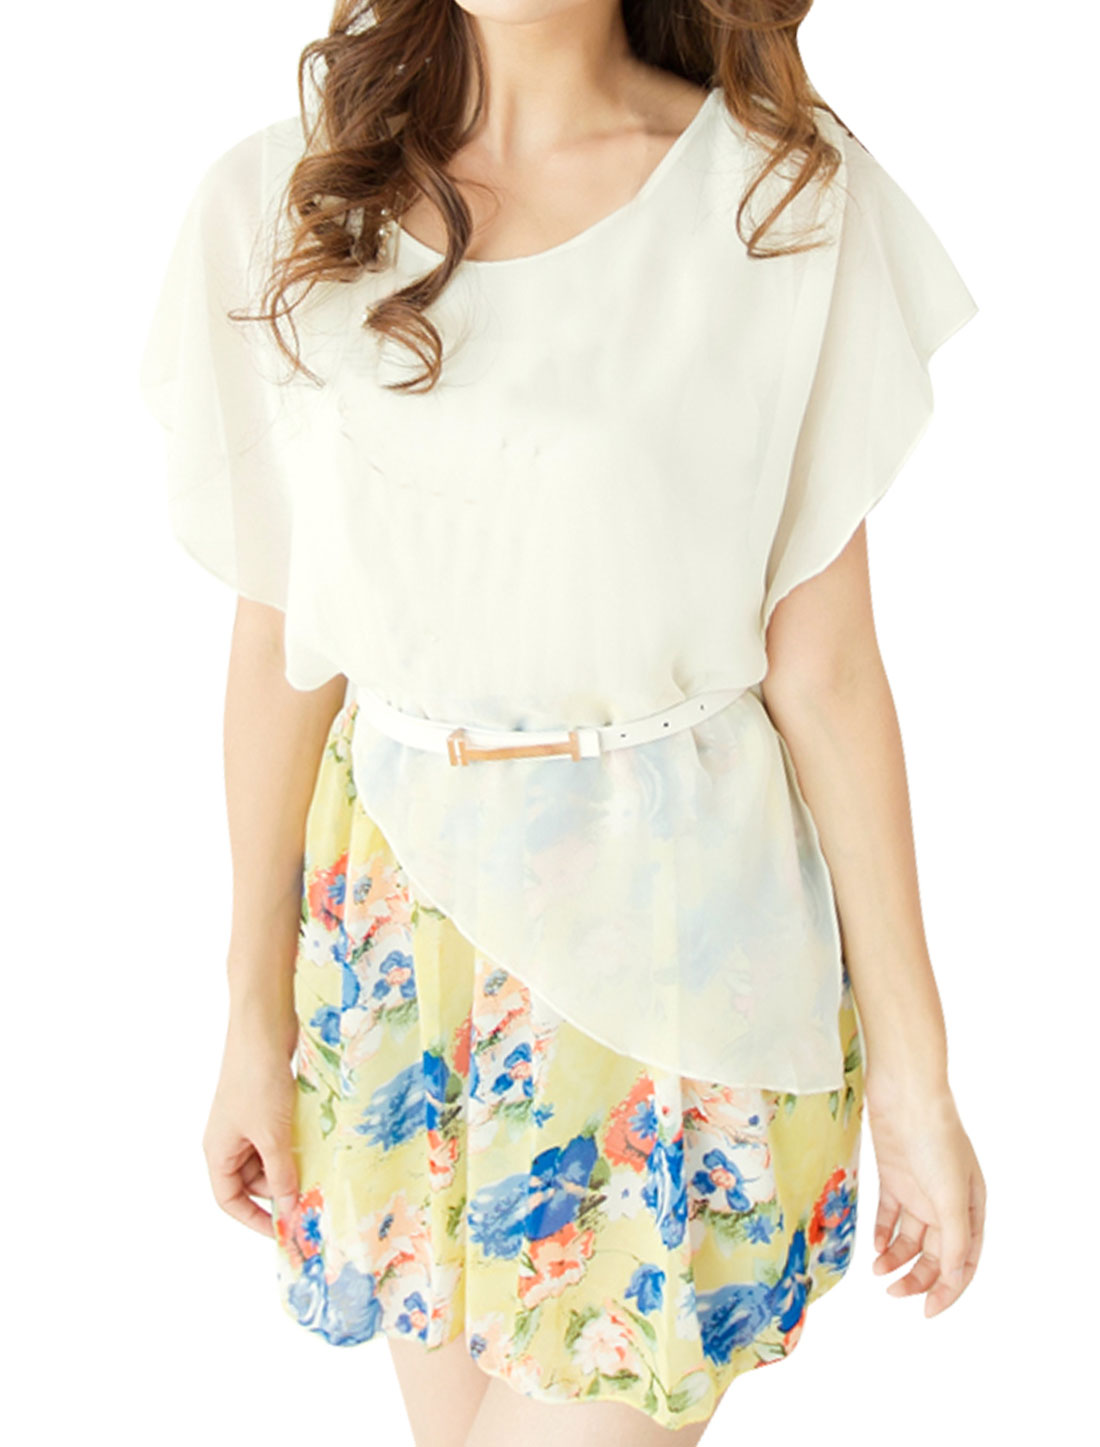 Lady Sleeveless Irregular Detail Chiffon Splice Florals Prints Off White Dress w Belt XS